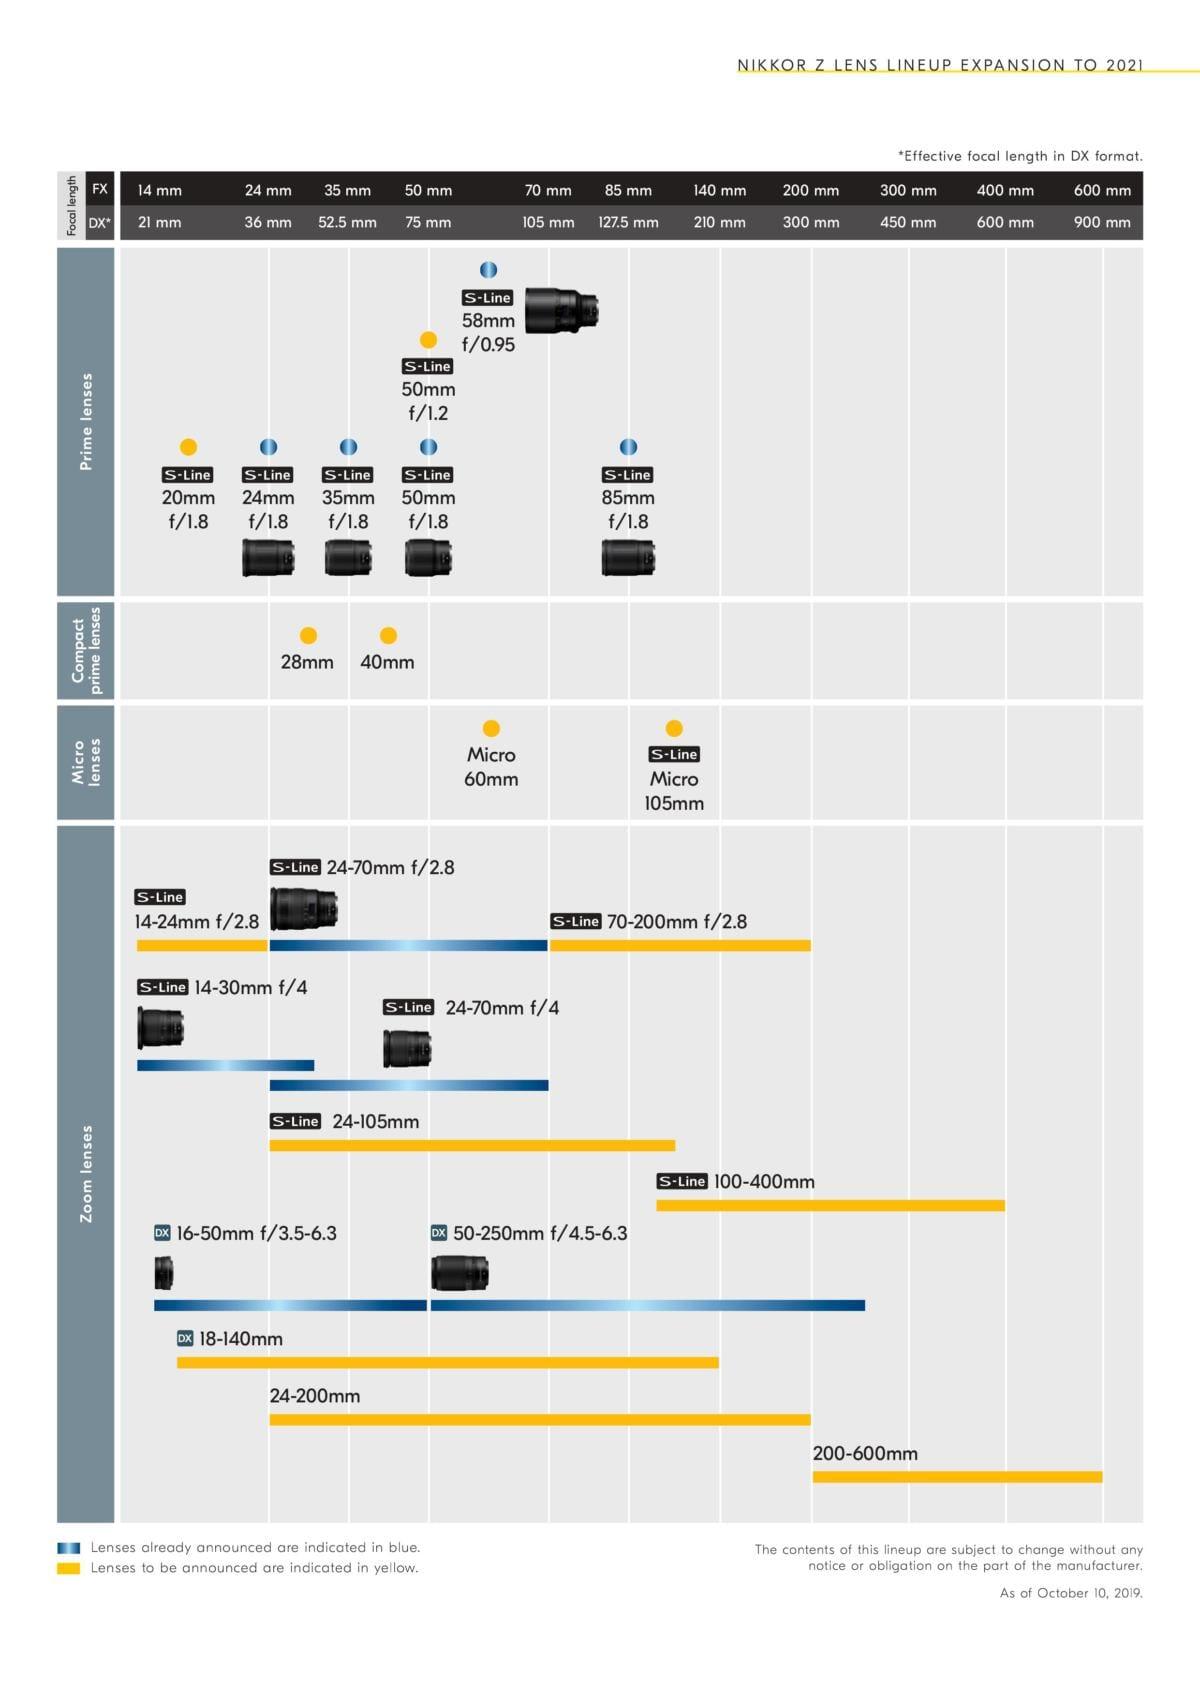 Nikon aktualisiert Roadmap und kündigt 9 neue Z-Objektive an ...